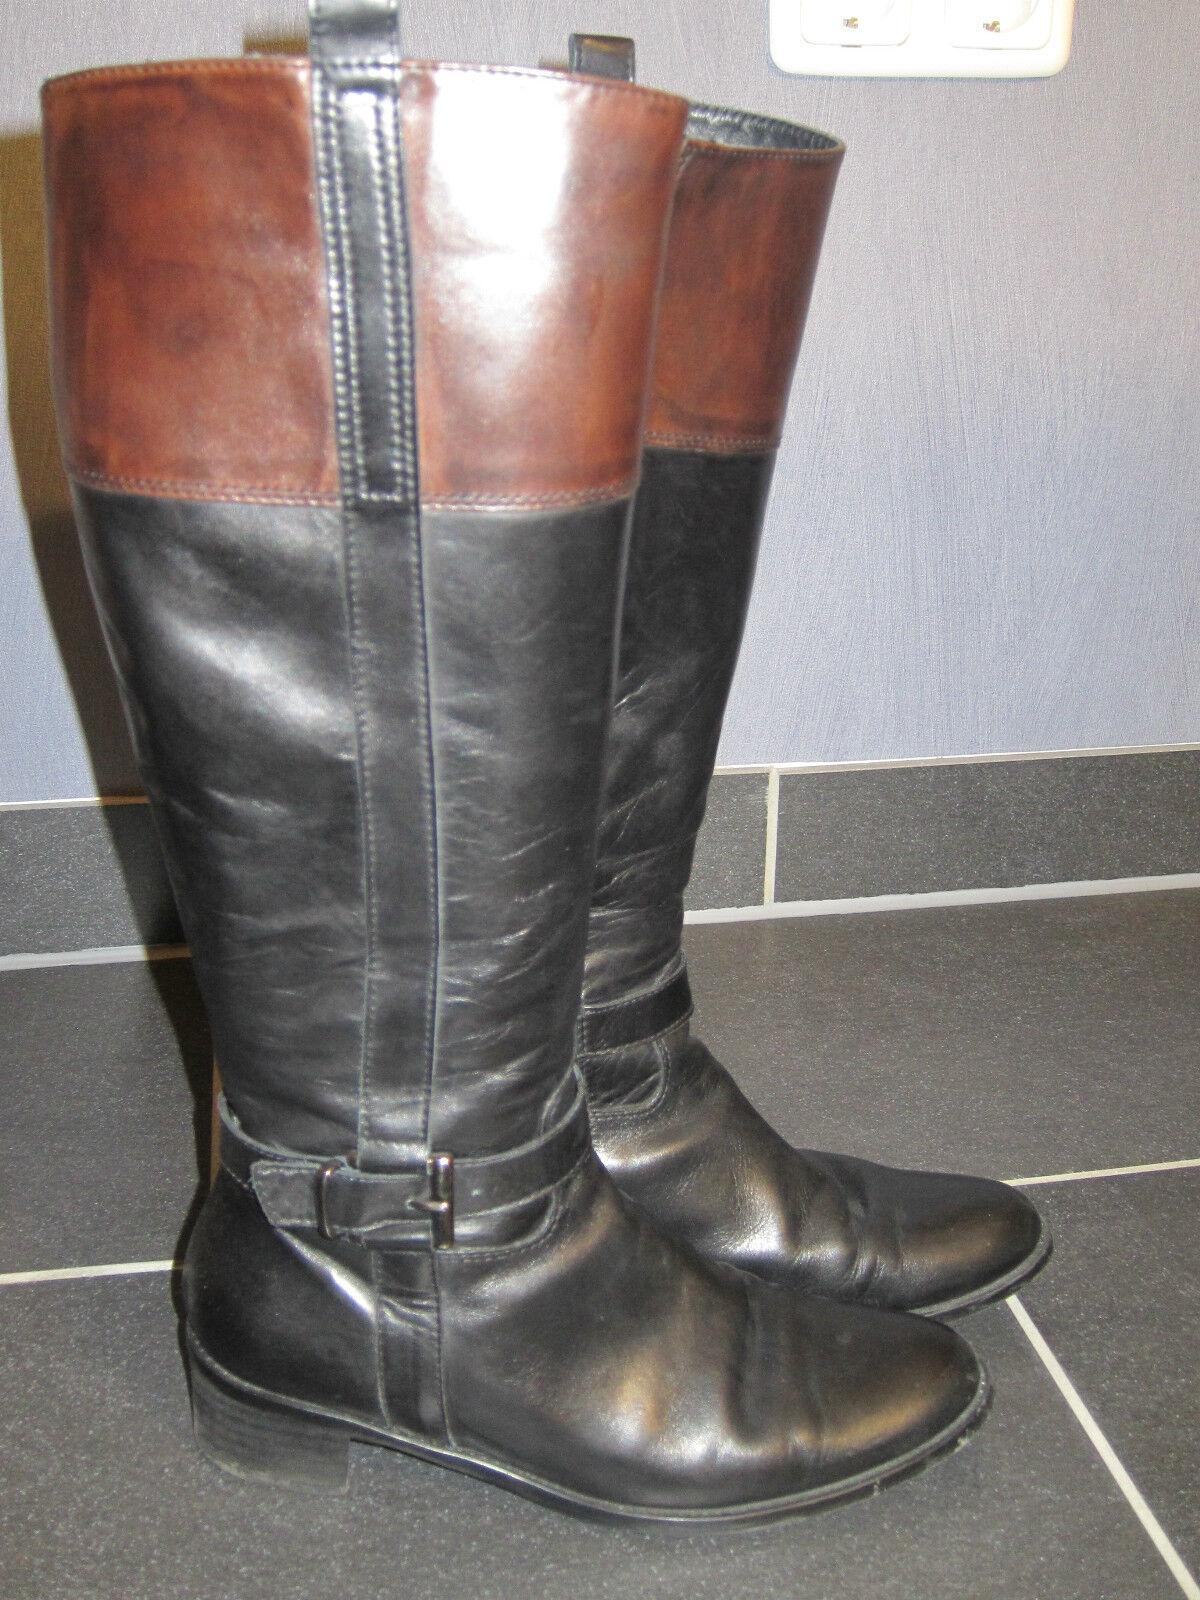 Franco Bonoldi - Stiefel Reitstiefel Gr. 39 sehr gepflegt, wenig getragen...TOP!